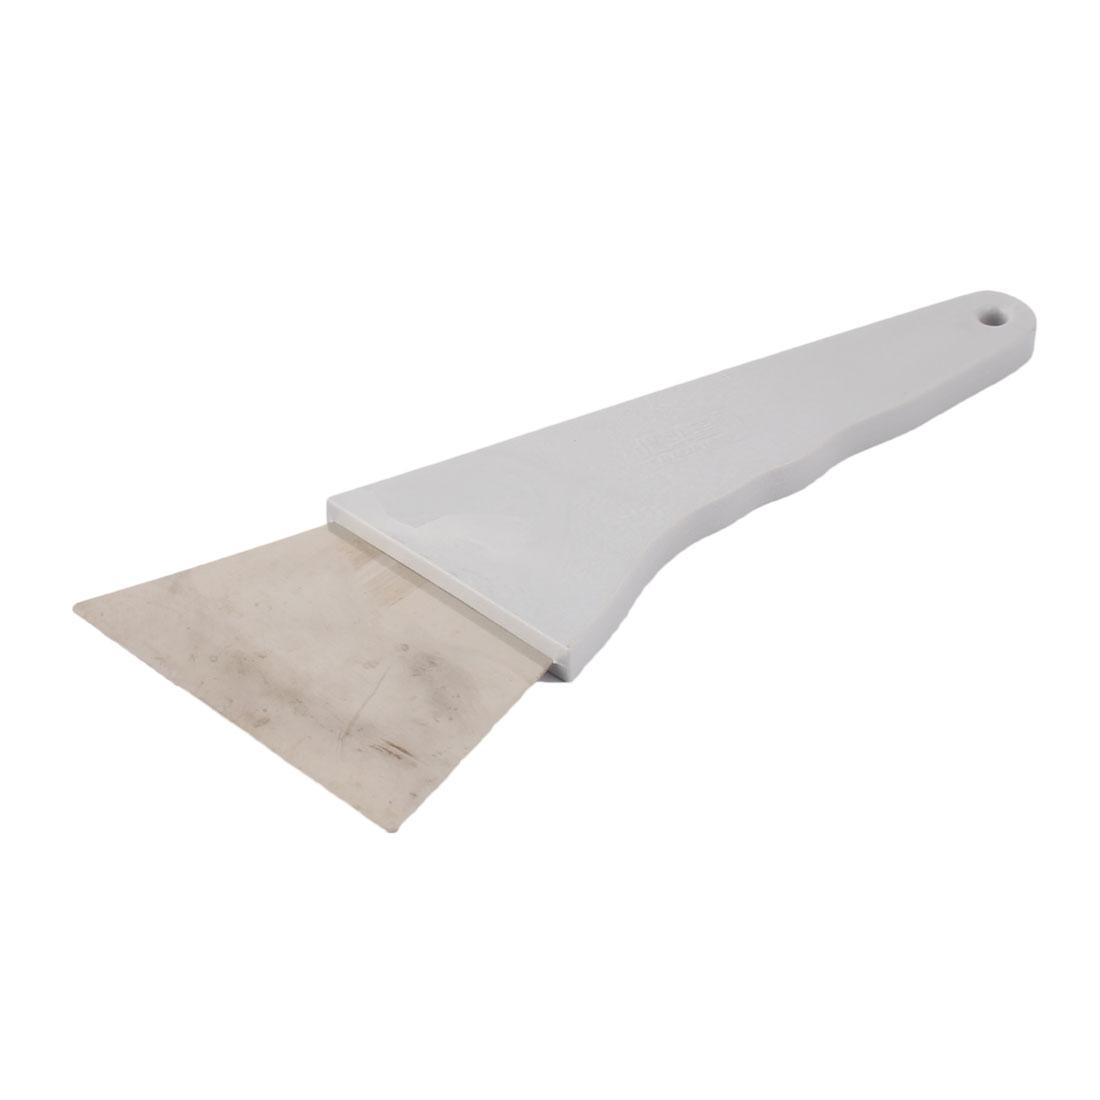 Car Windscreen Window Film Wrap Tint Cleaning Scraper Light Gray 23 x 10.2 x 1cm